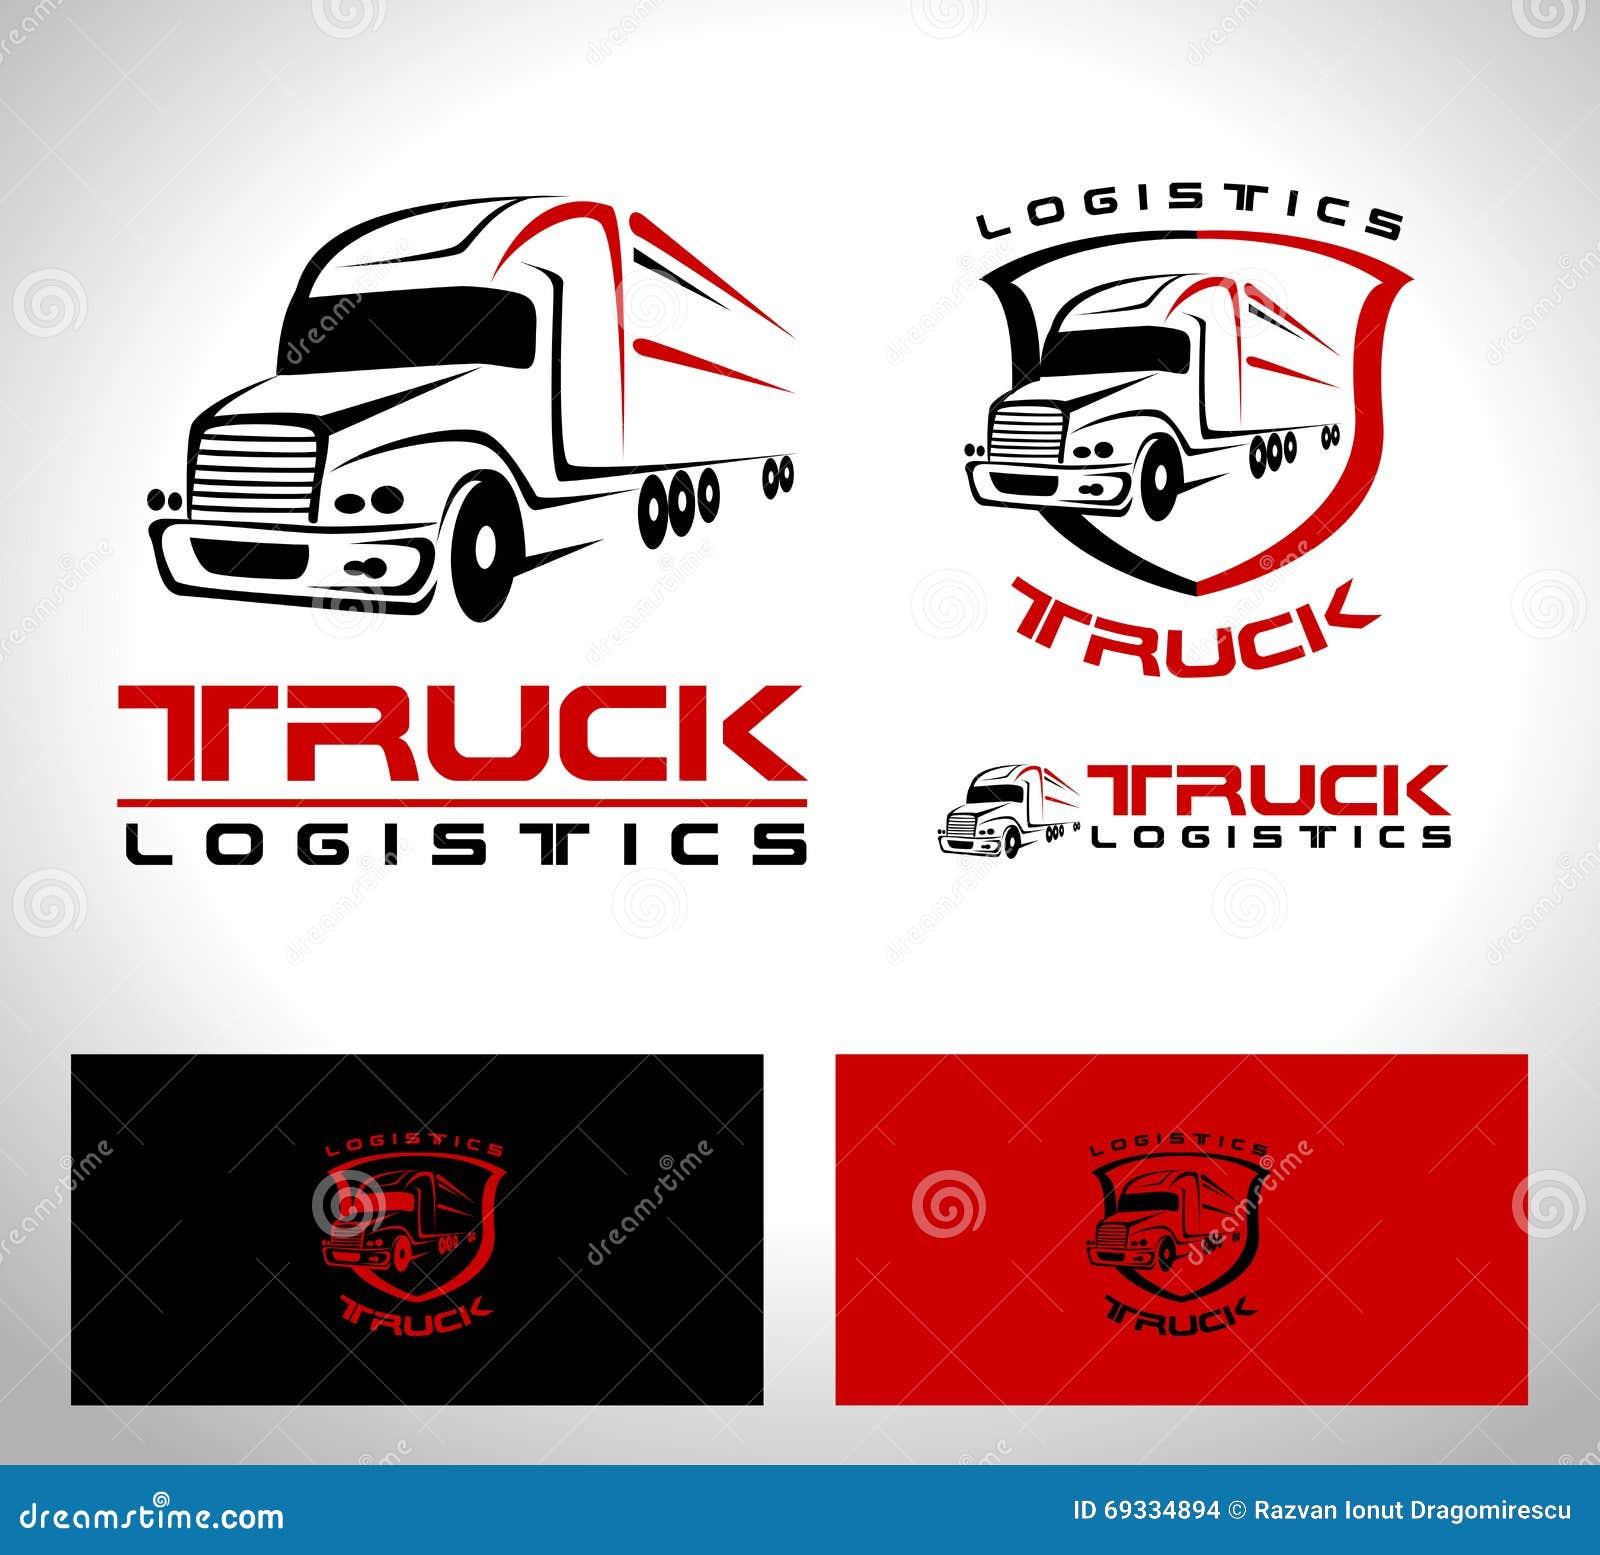 Trailer Cartoons, Illustrations & Vector Stock Images ...